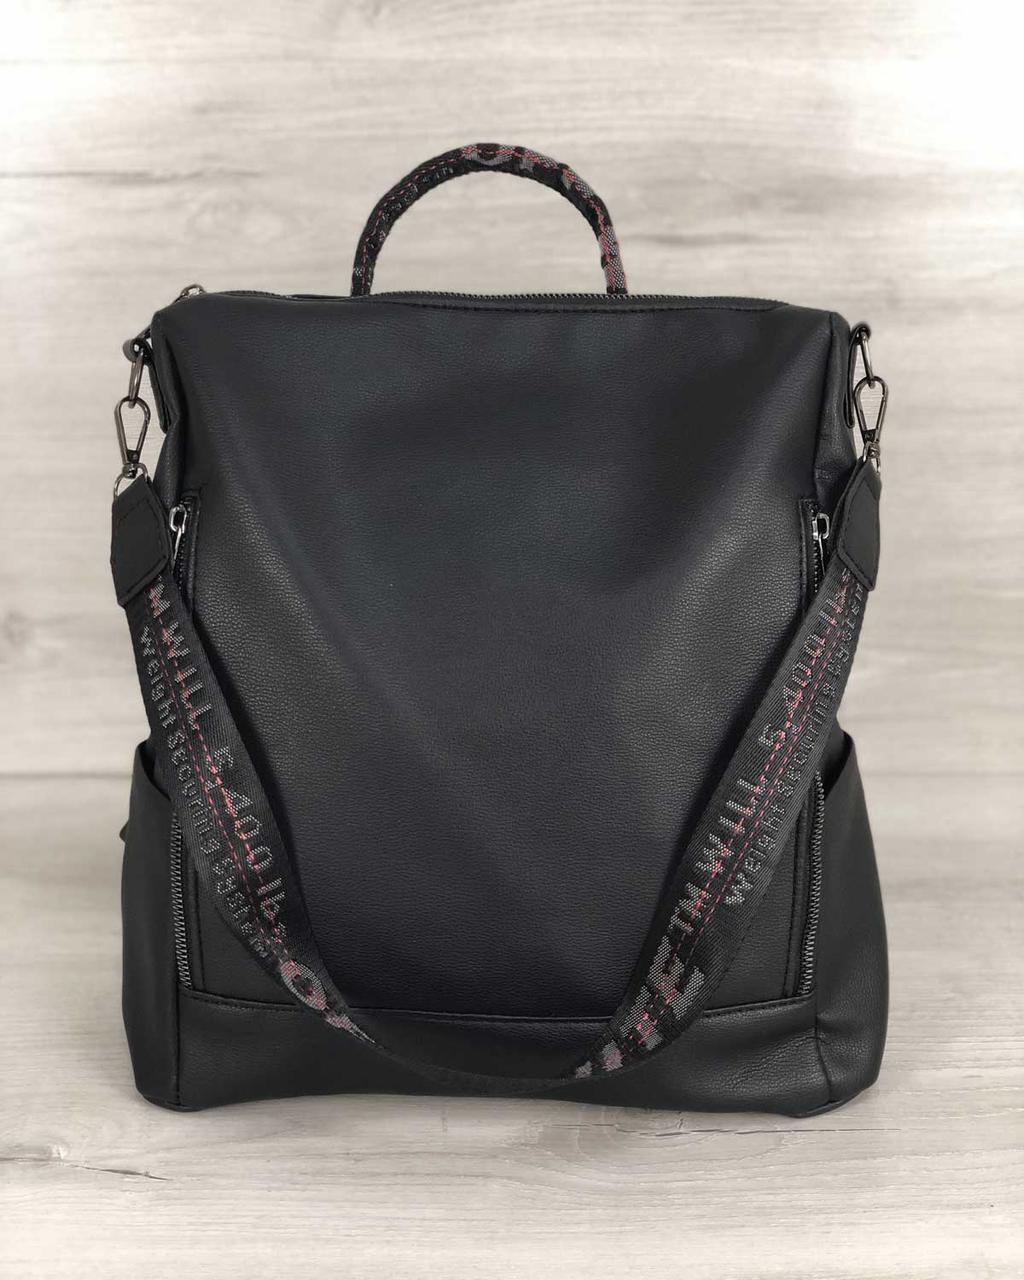 Стильний сумка-рюкзак Taus чорного кольору